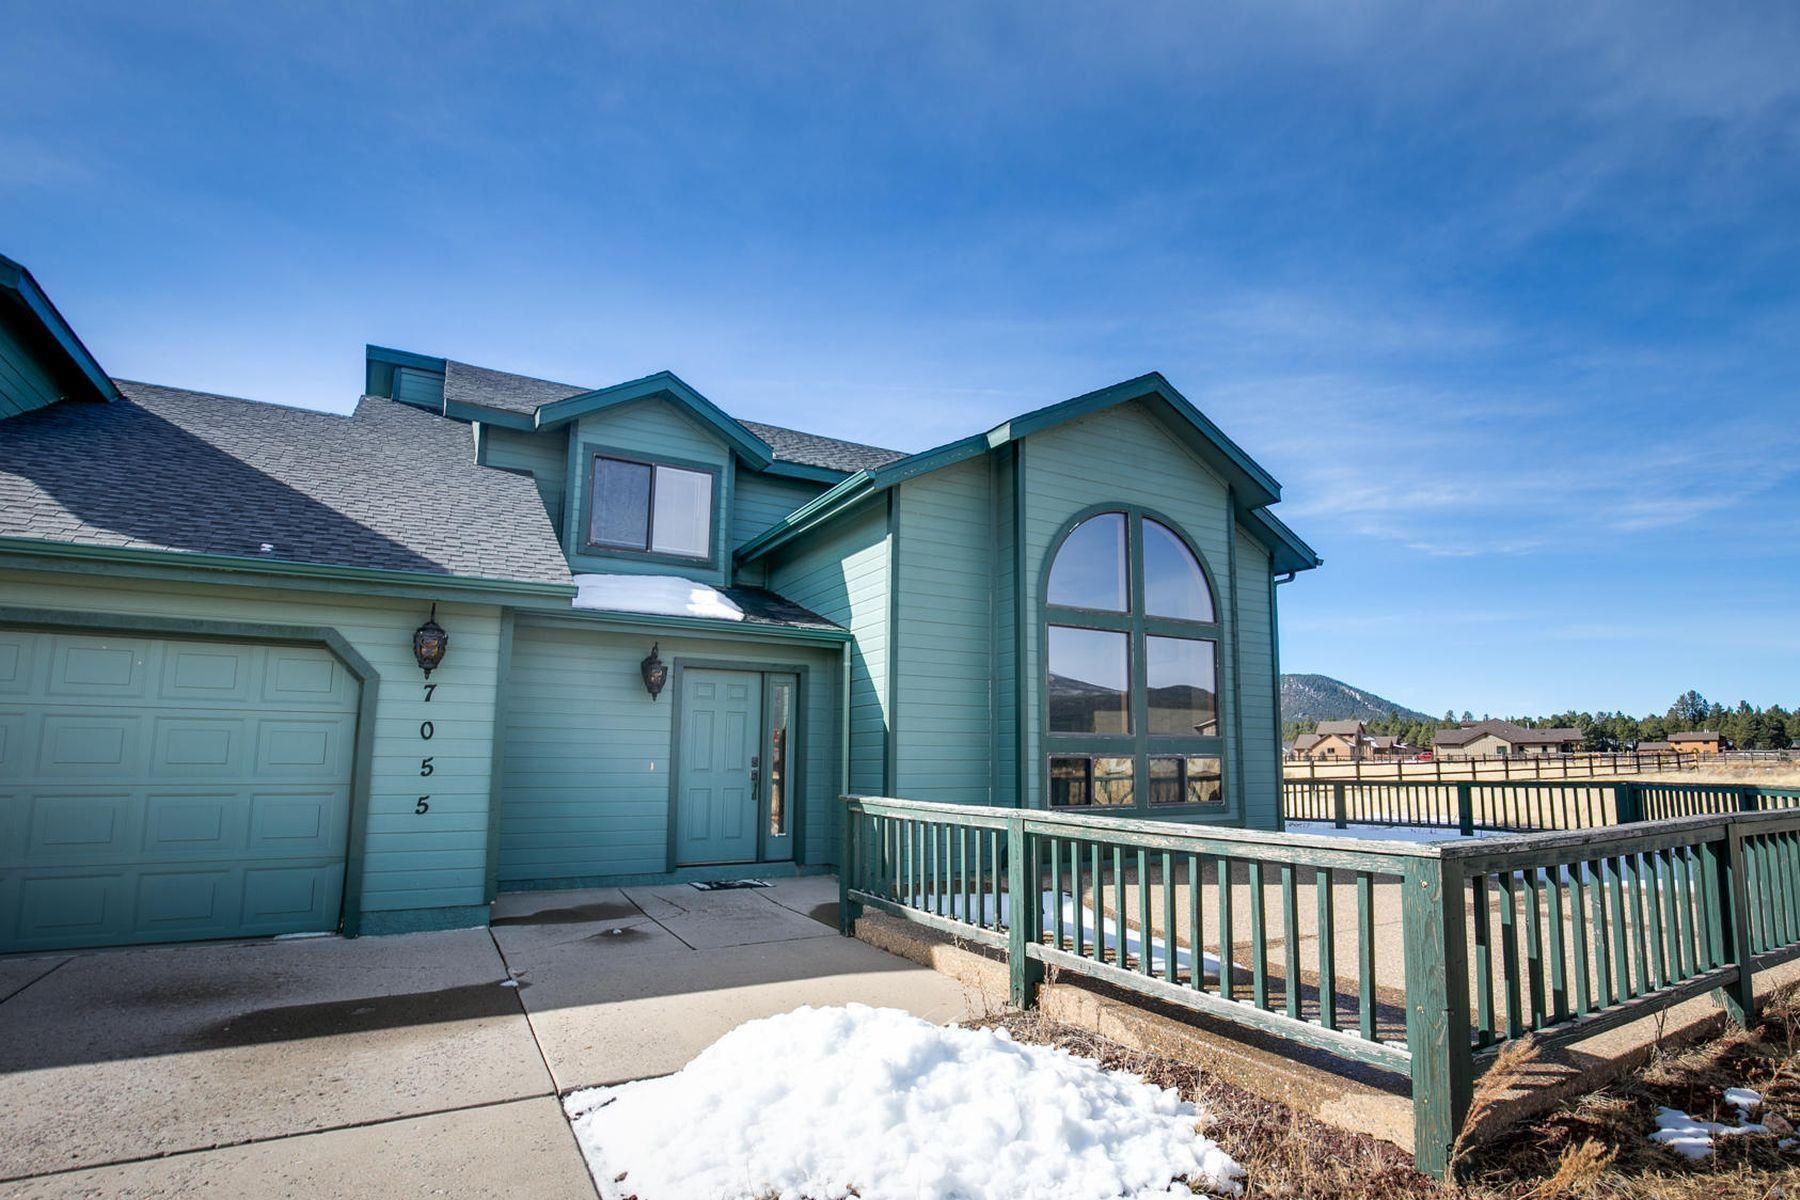 واحد منزل الأسرة للـ Sale في Gorgeous home with spectacular views 7055 N Greene Ln, Flagstaff, Arizona, 86001 United States